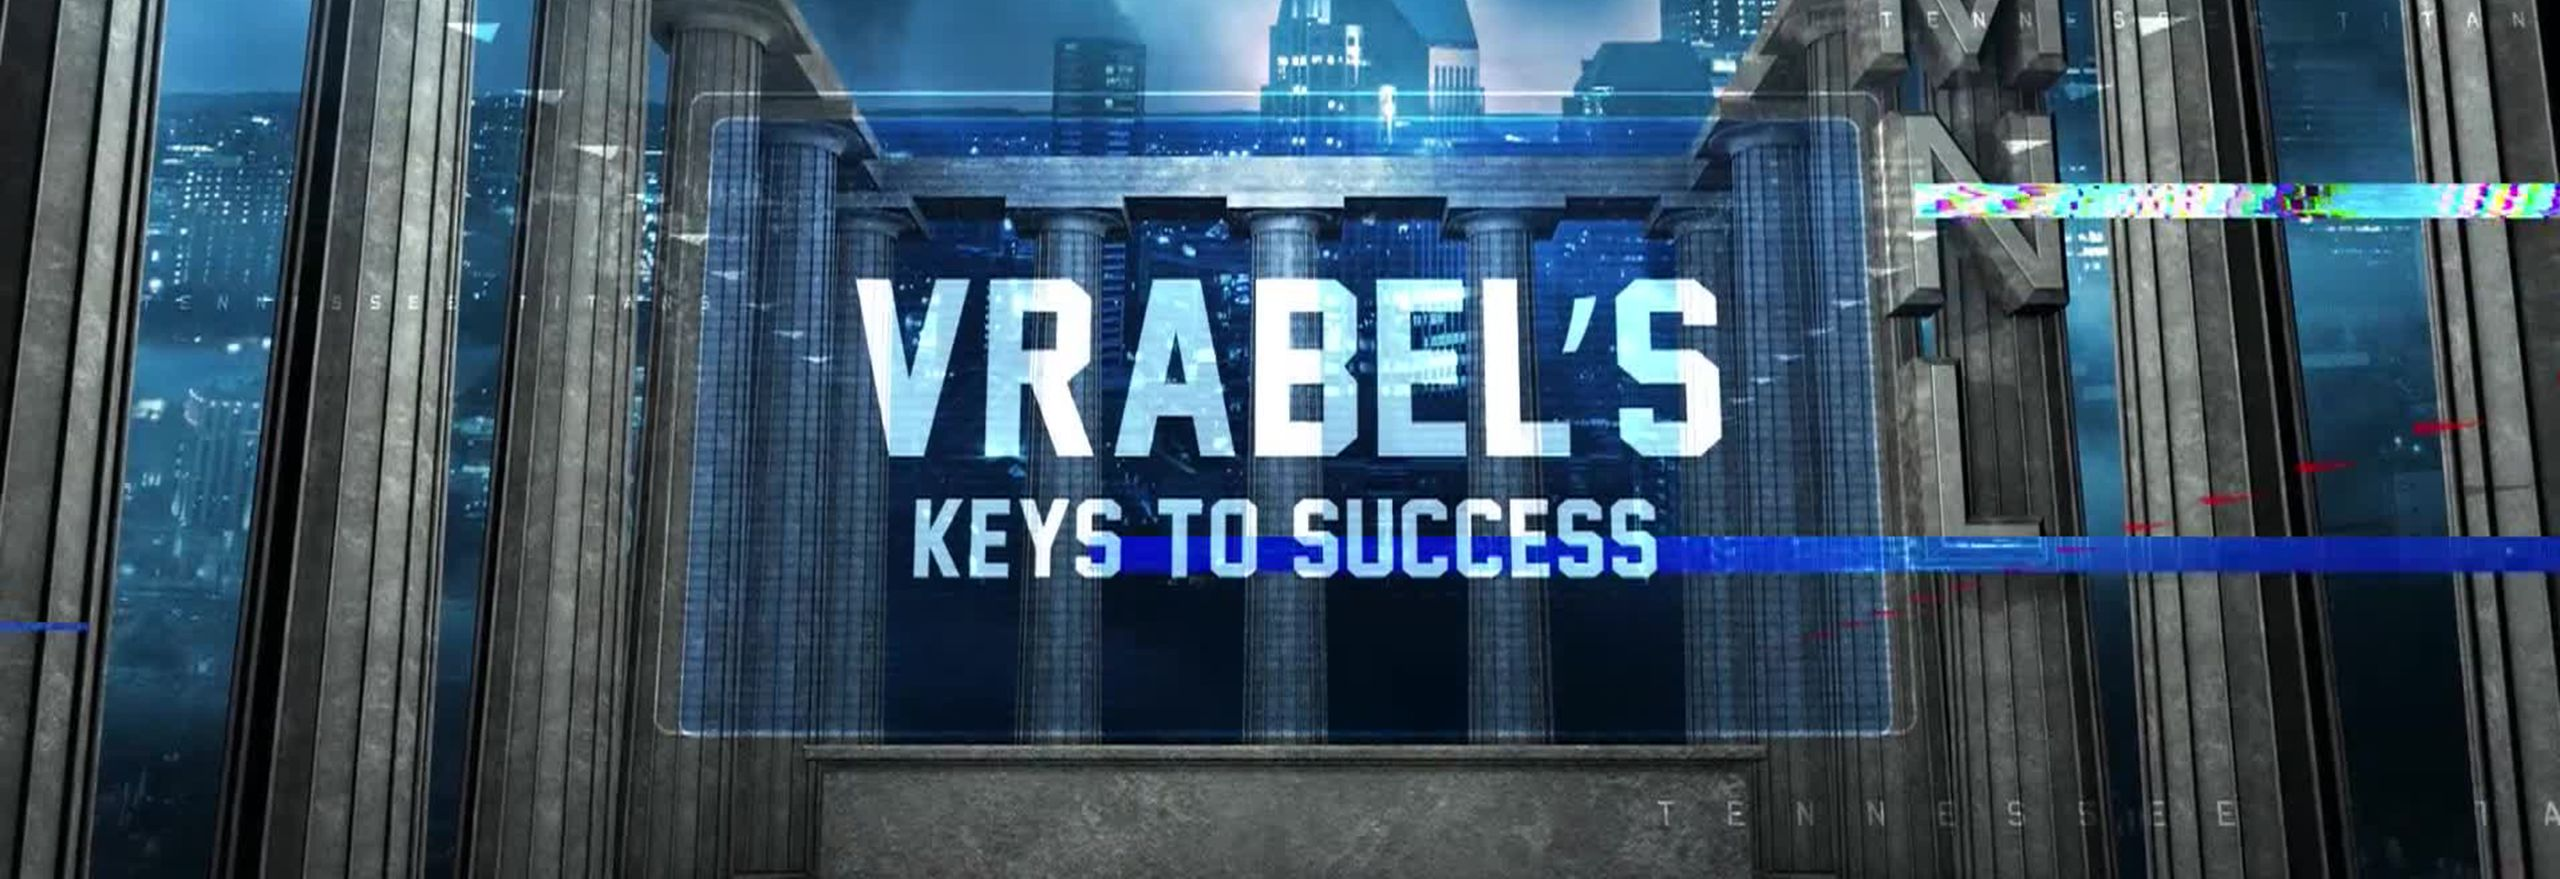 keys-to-success2560x879